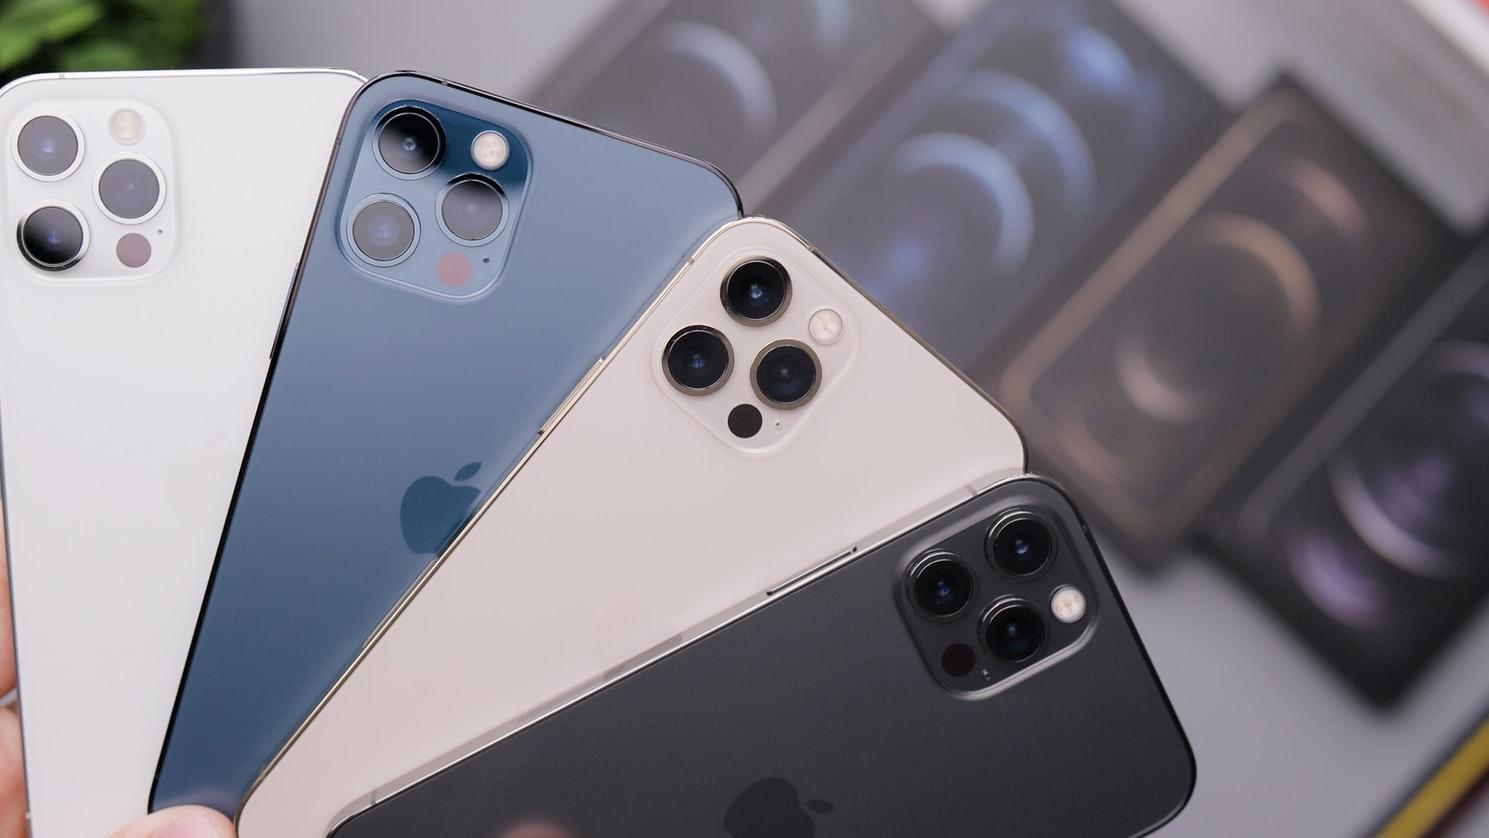 Najlepsze etui na iPhone 12 i 12 Pro – ranking TOP 5